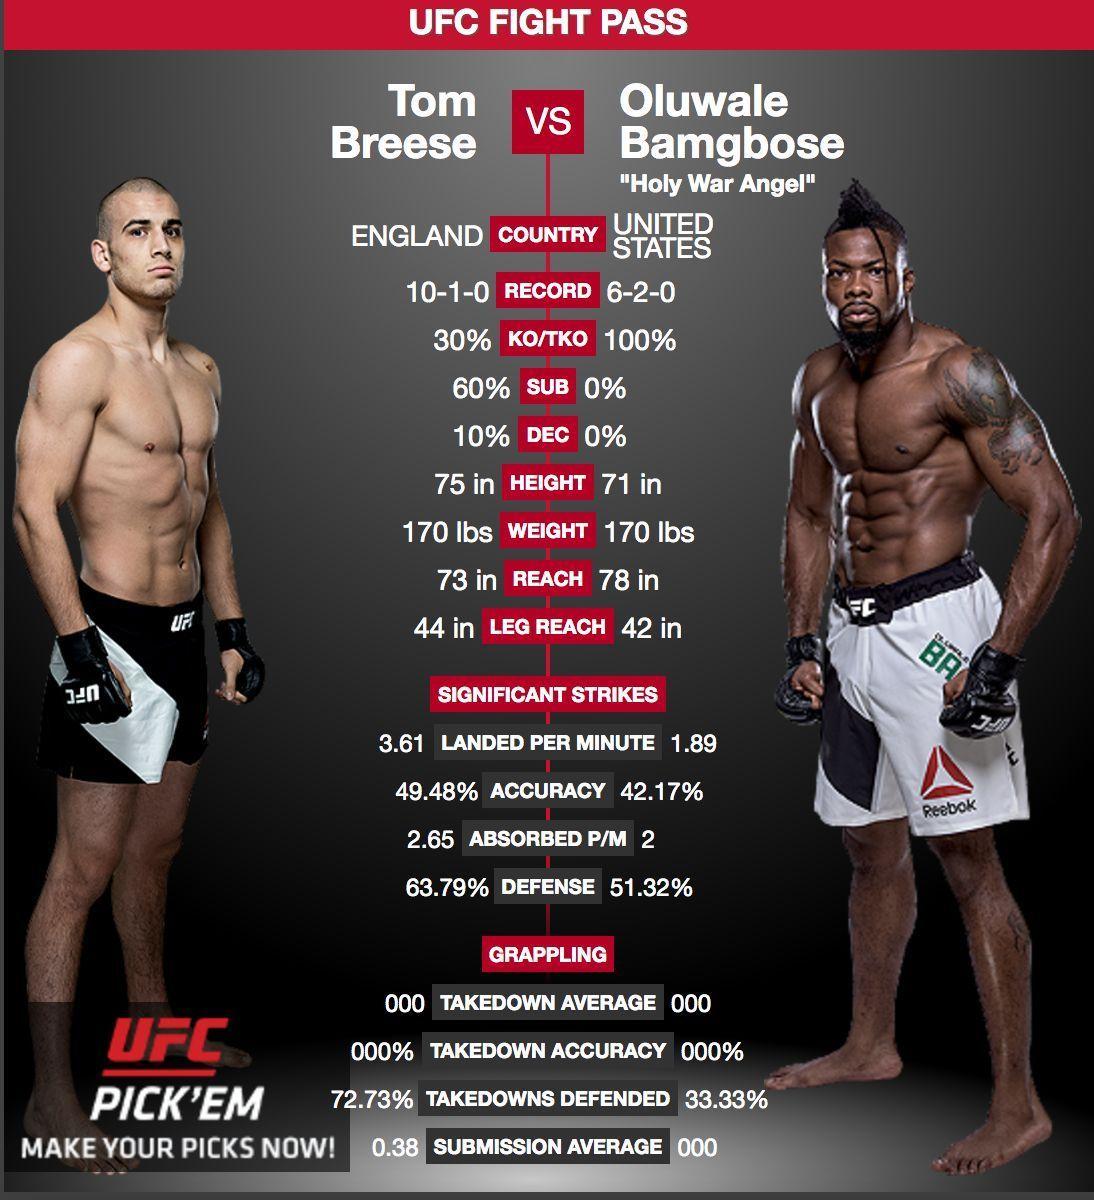 Wow Holywarangel Oluwalebamgbose Holywarangel Has A Whole 5 Inches Reach Advantage Over Tombreese Breesemma How Will That A Ufc Ufc News Ufc Fight Night